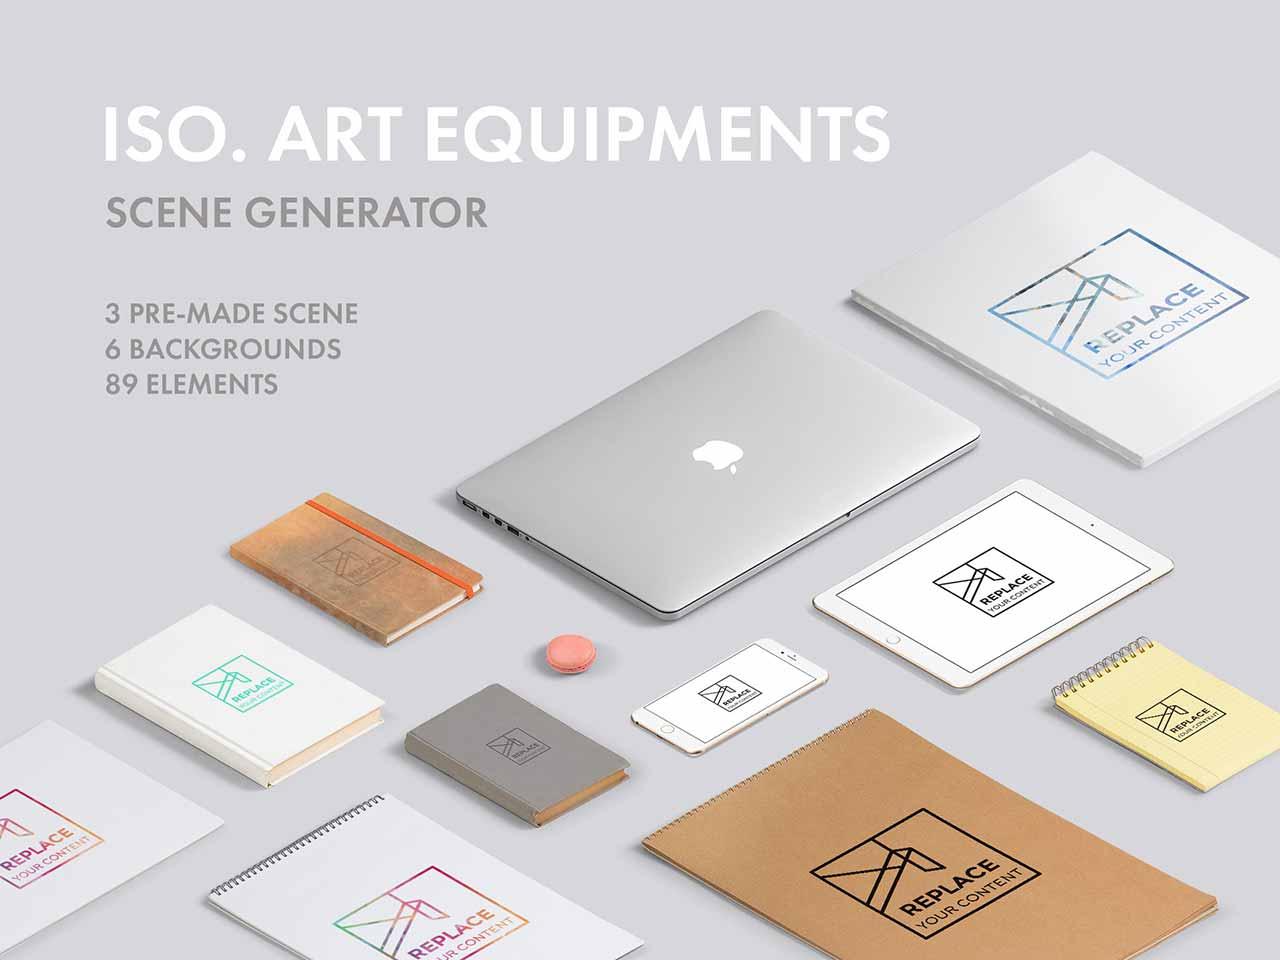 Iso. Art Scene Generator